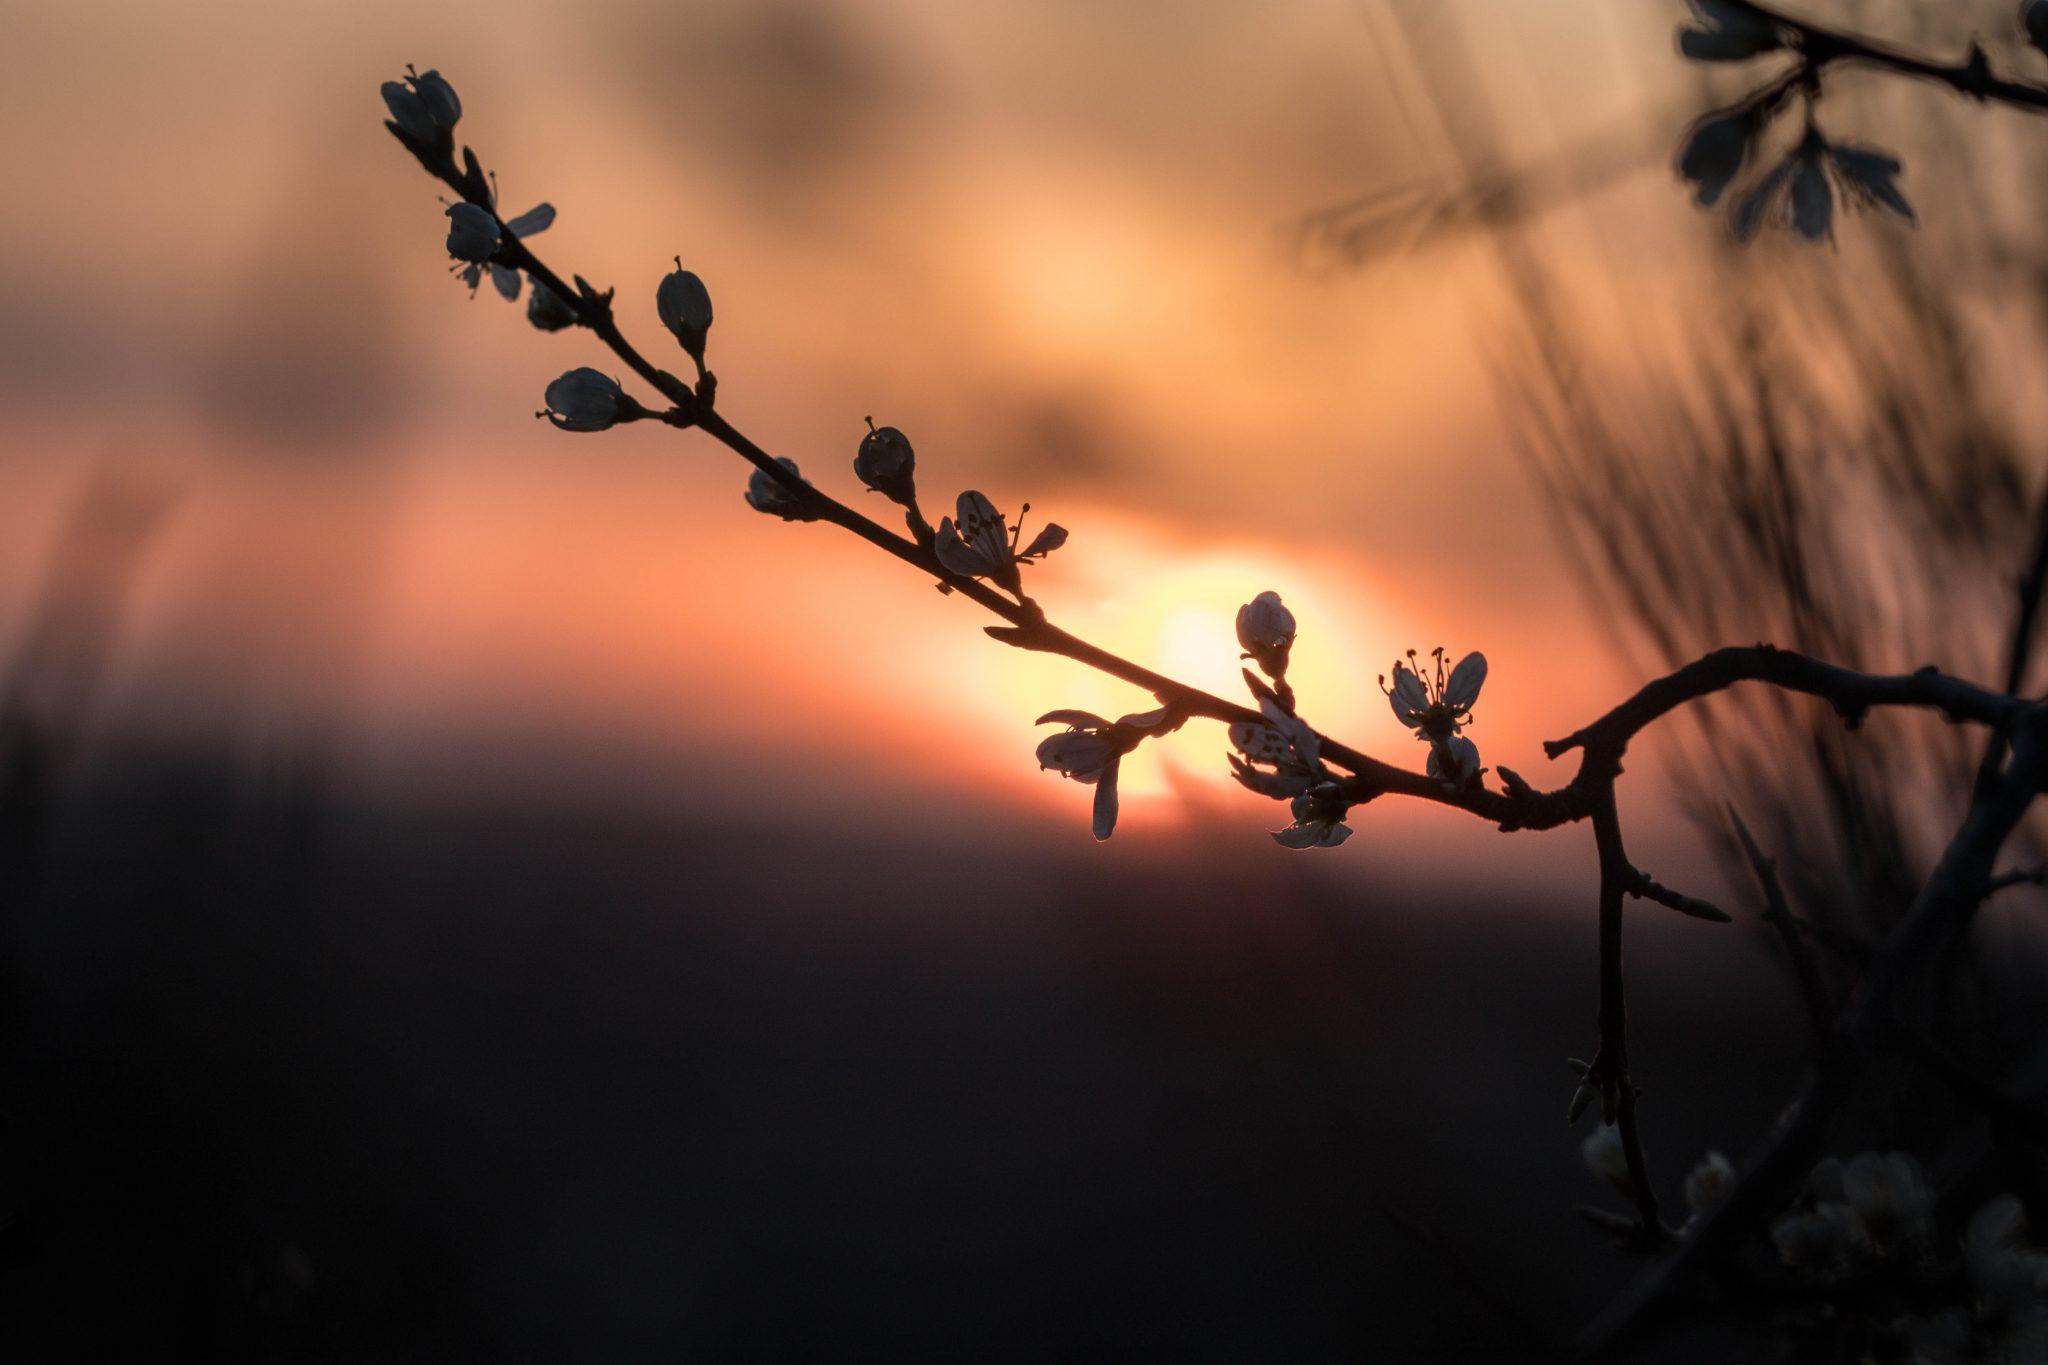 Zonsondergang knooppunt 150. Sint-Truiden. Bloesems bij zonsondergang.